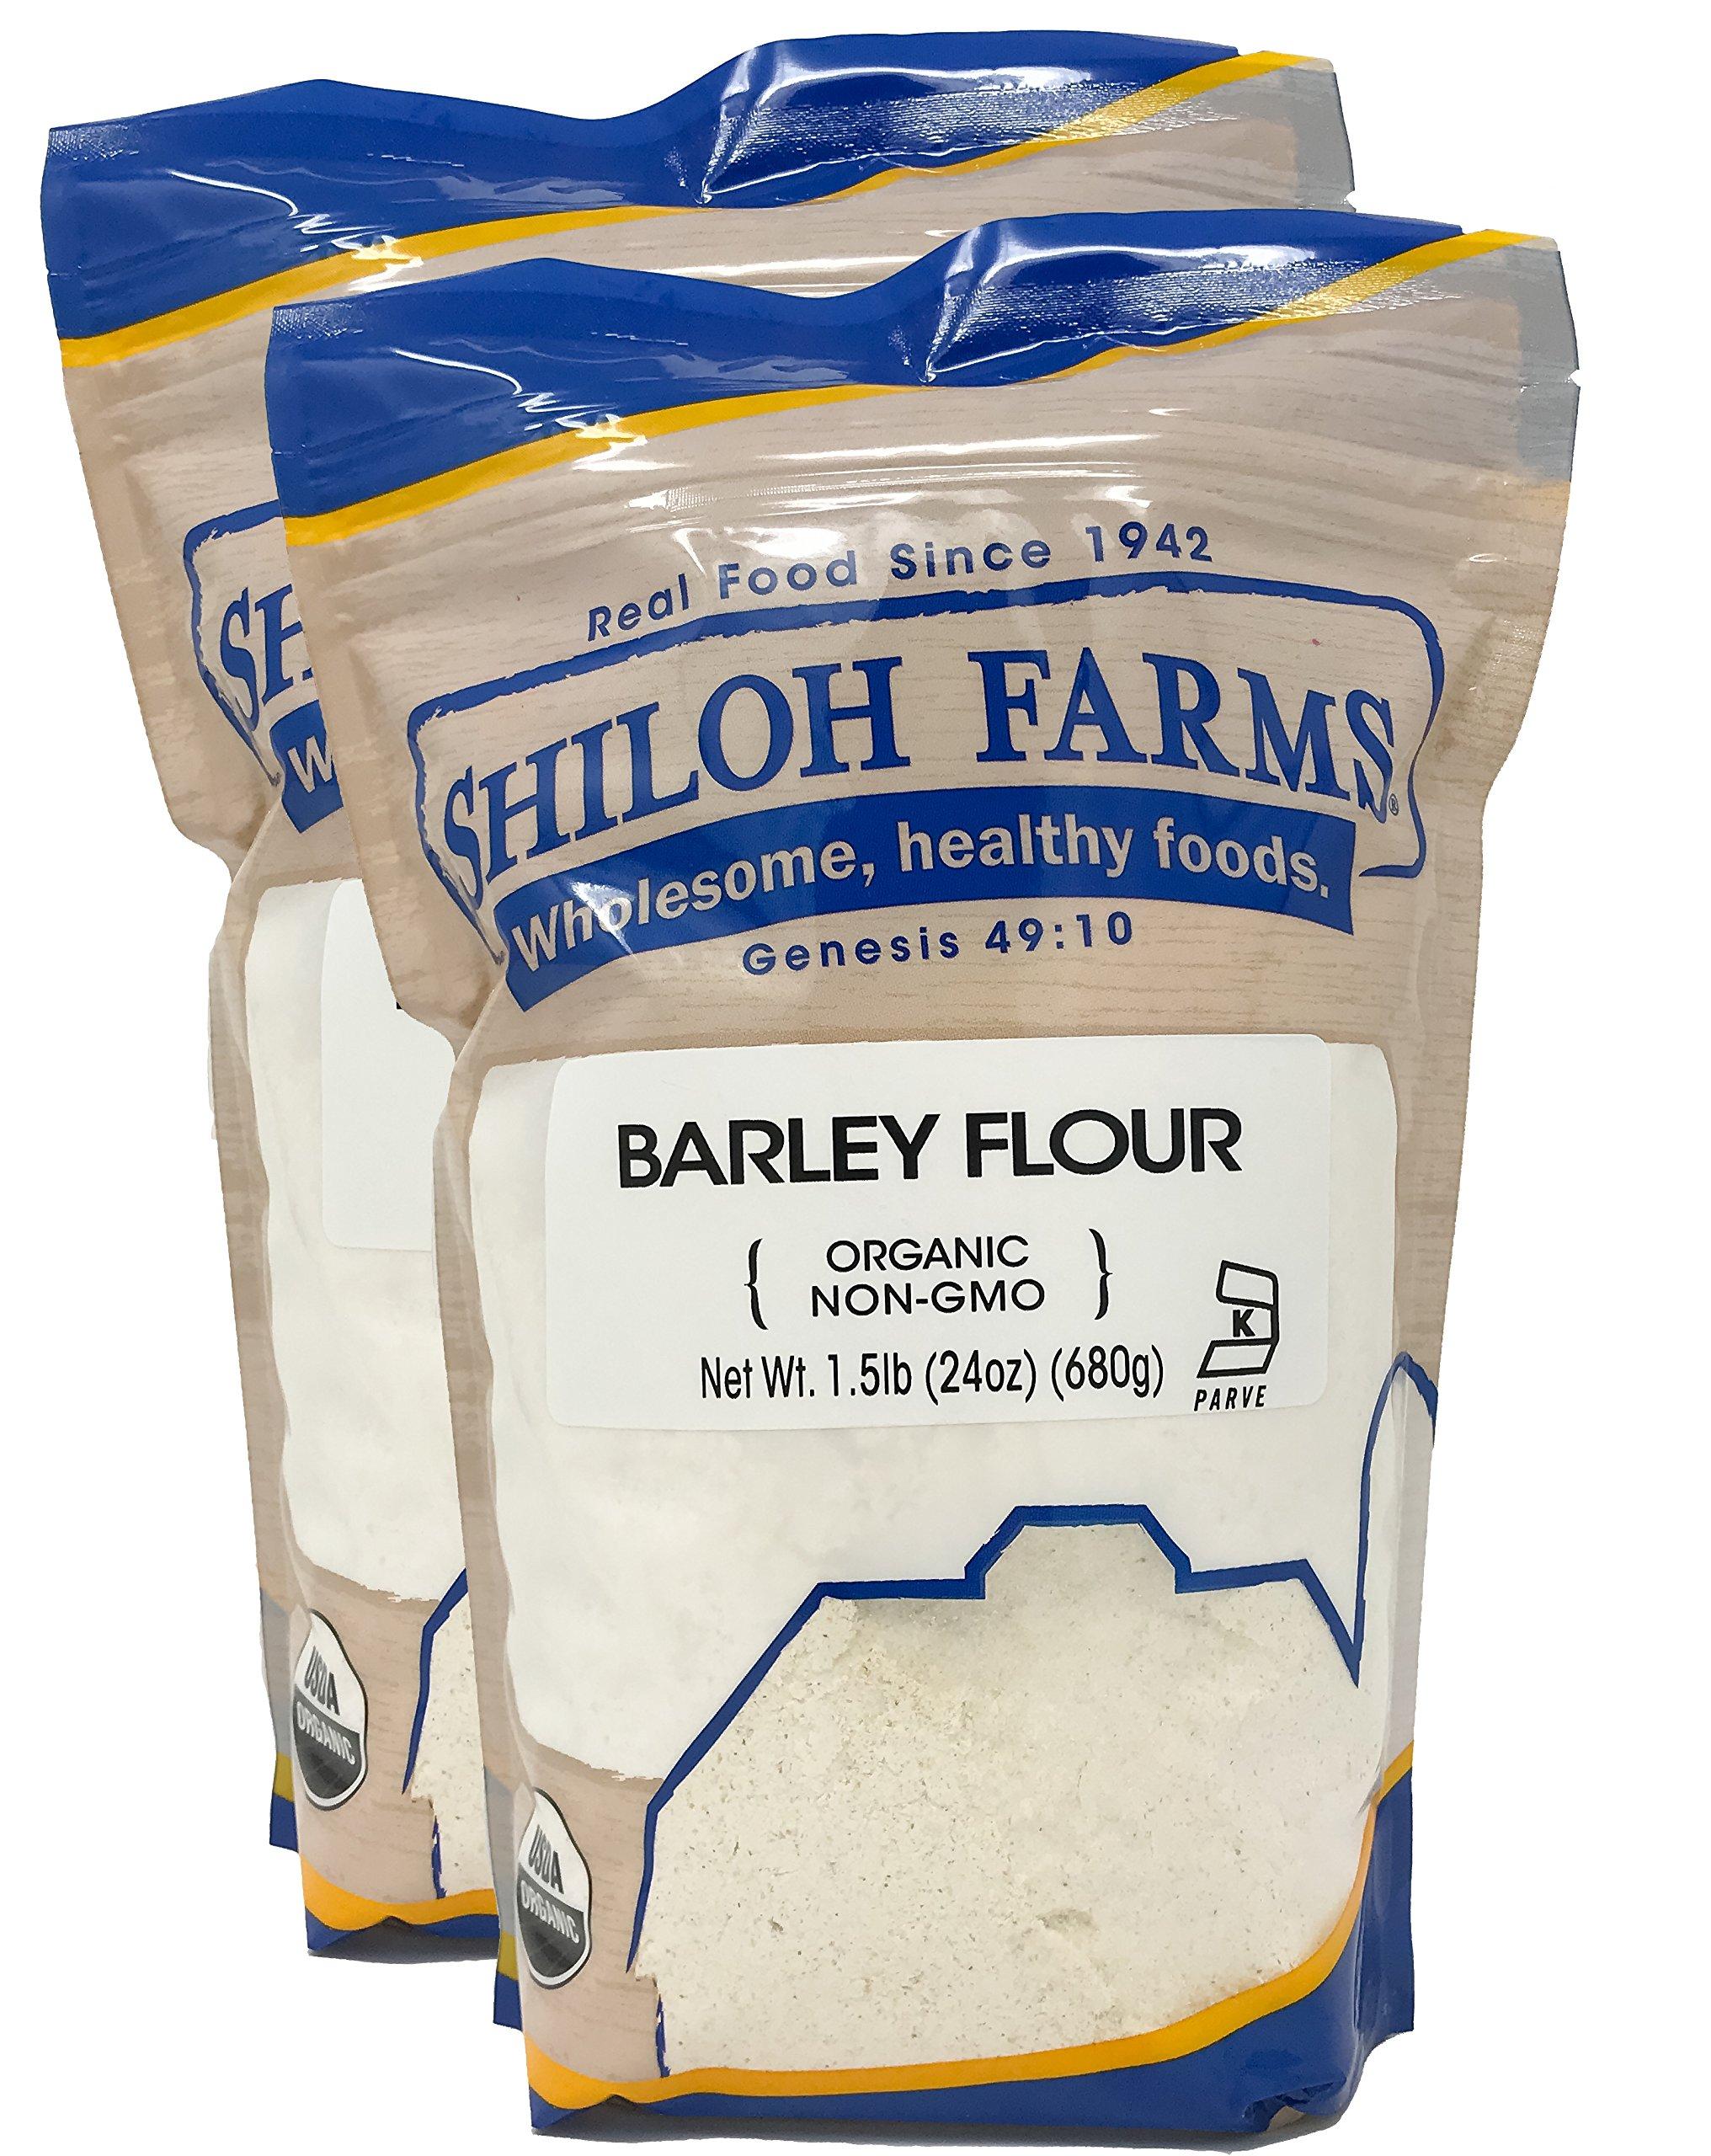 Shiloh Farms - Organic Barley Flour 24 oz - 2 pack